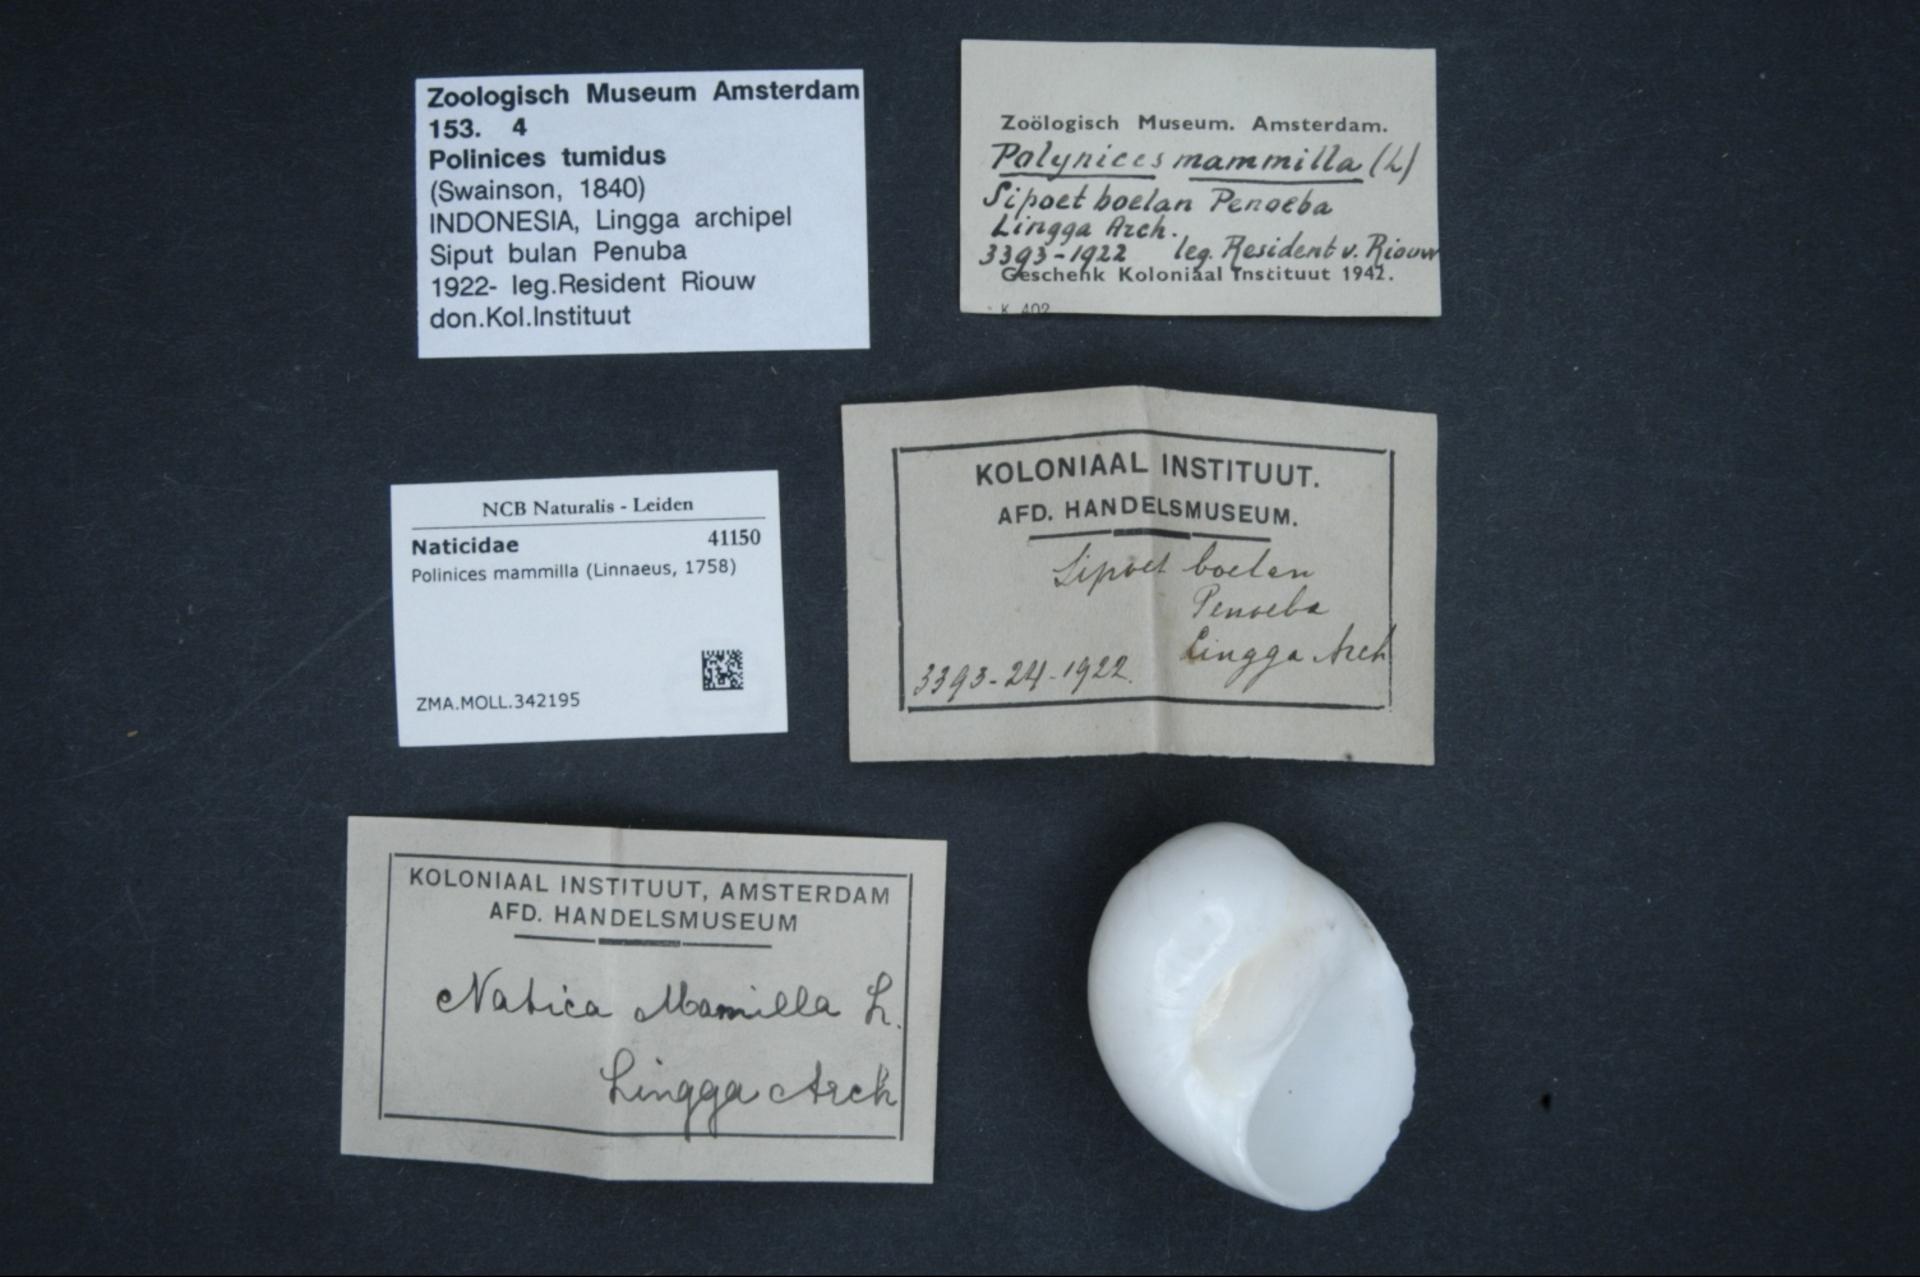 ZMA.MOLL.342195 | Polinices mammilla (Linnaeus, 1758)